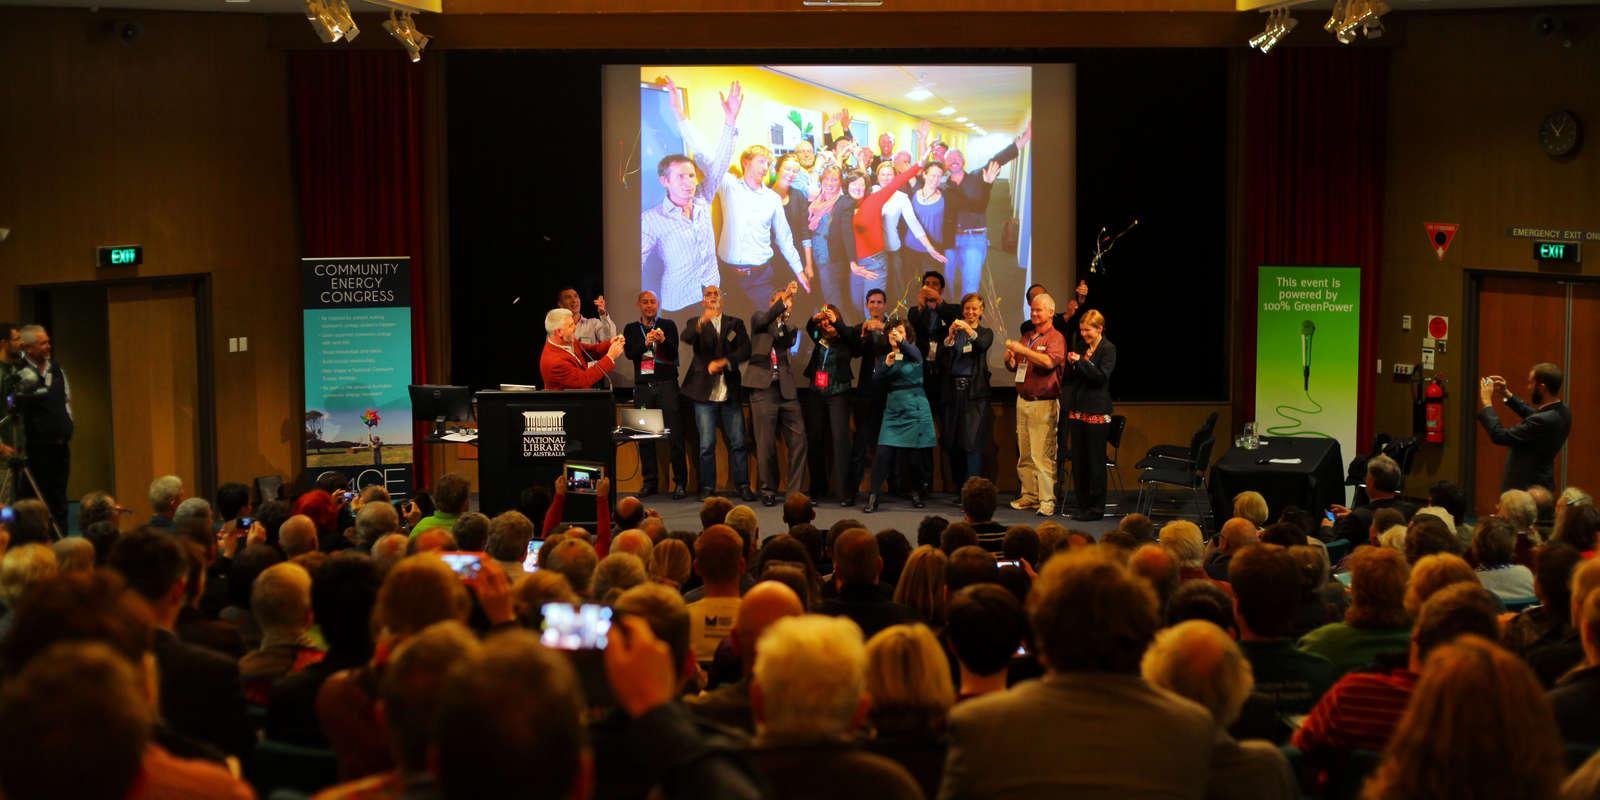 Community Energy Congress 2014